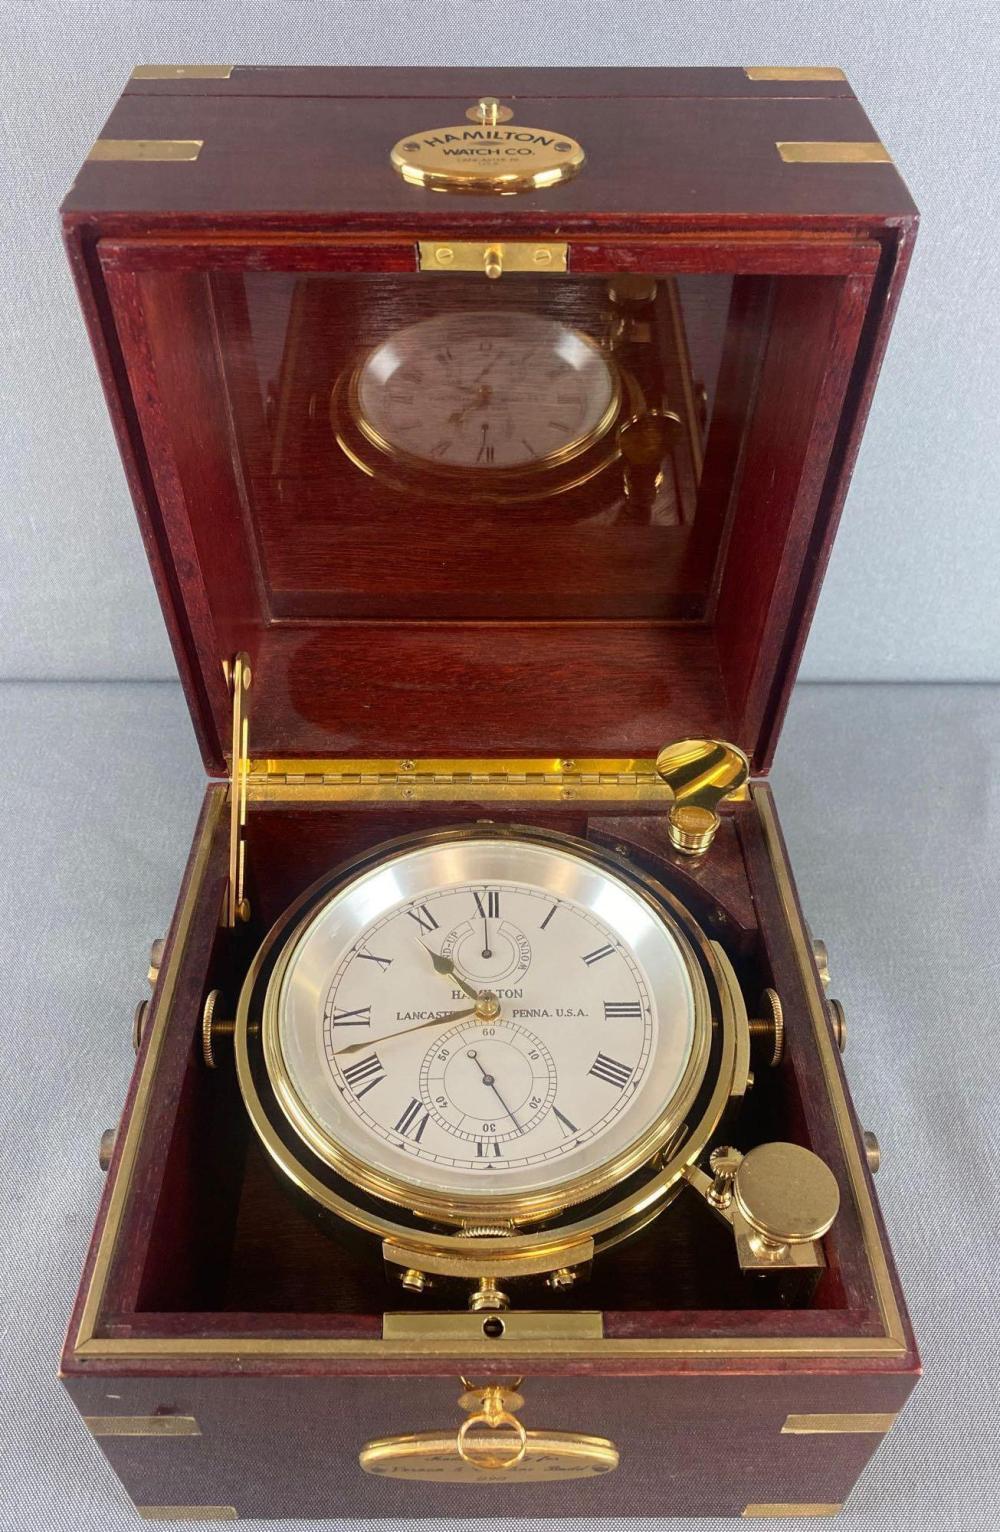 Hamilton Watch Co. Marine Chronometer